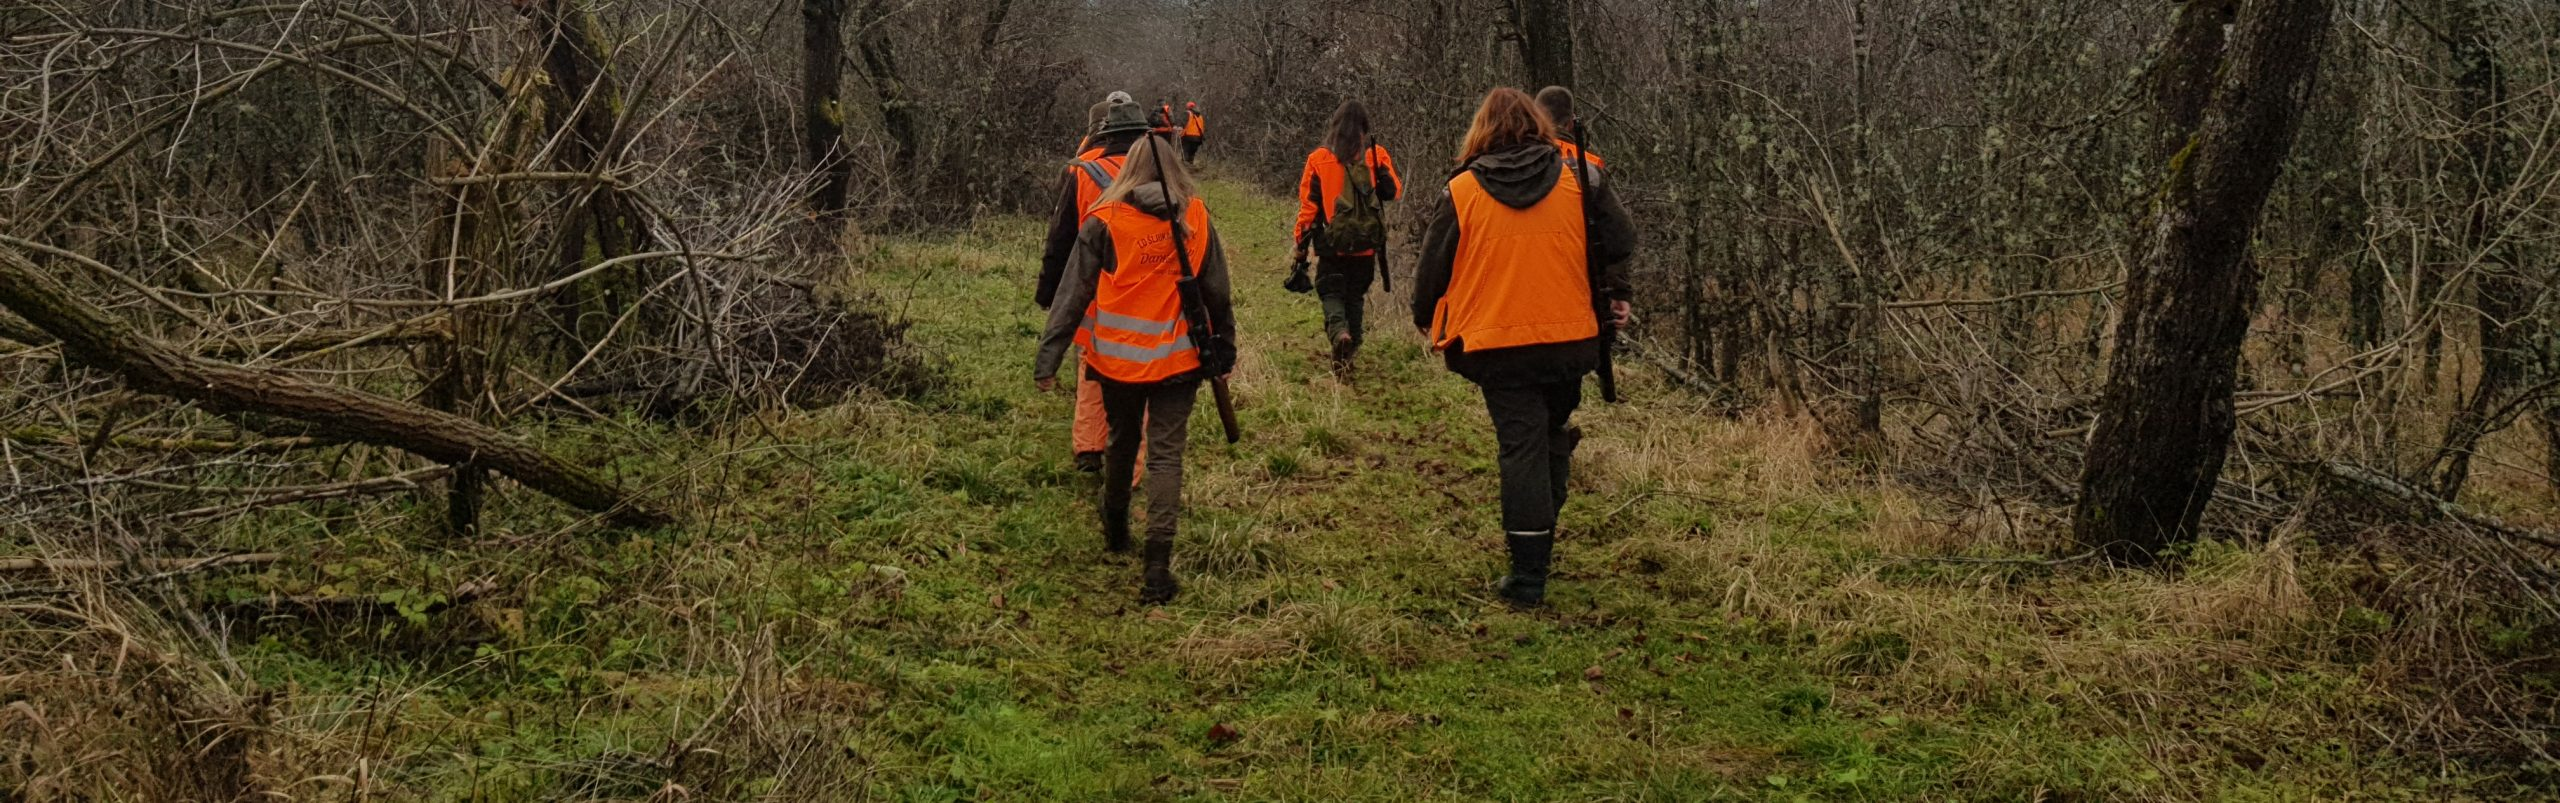 Zaljubite se u lov